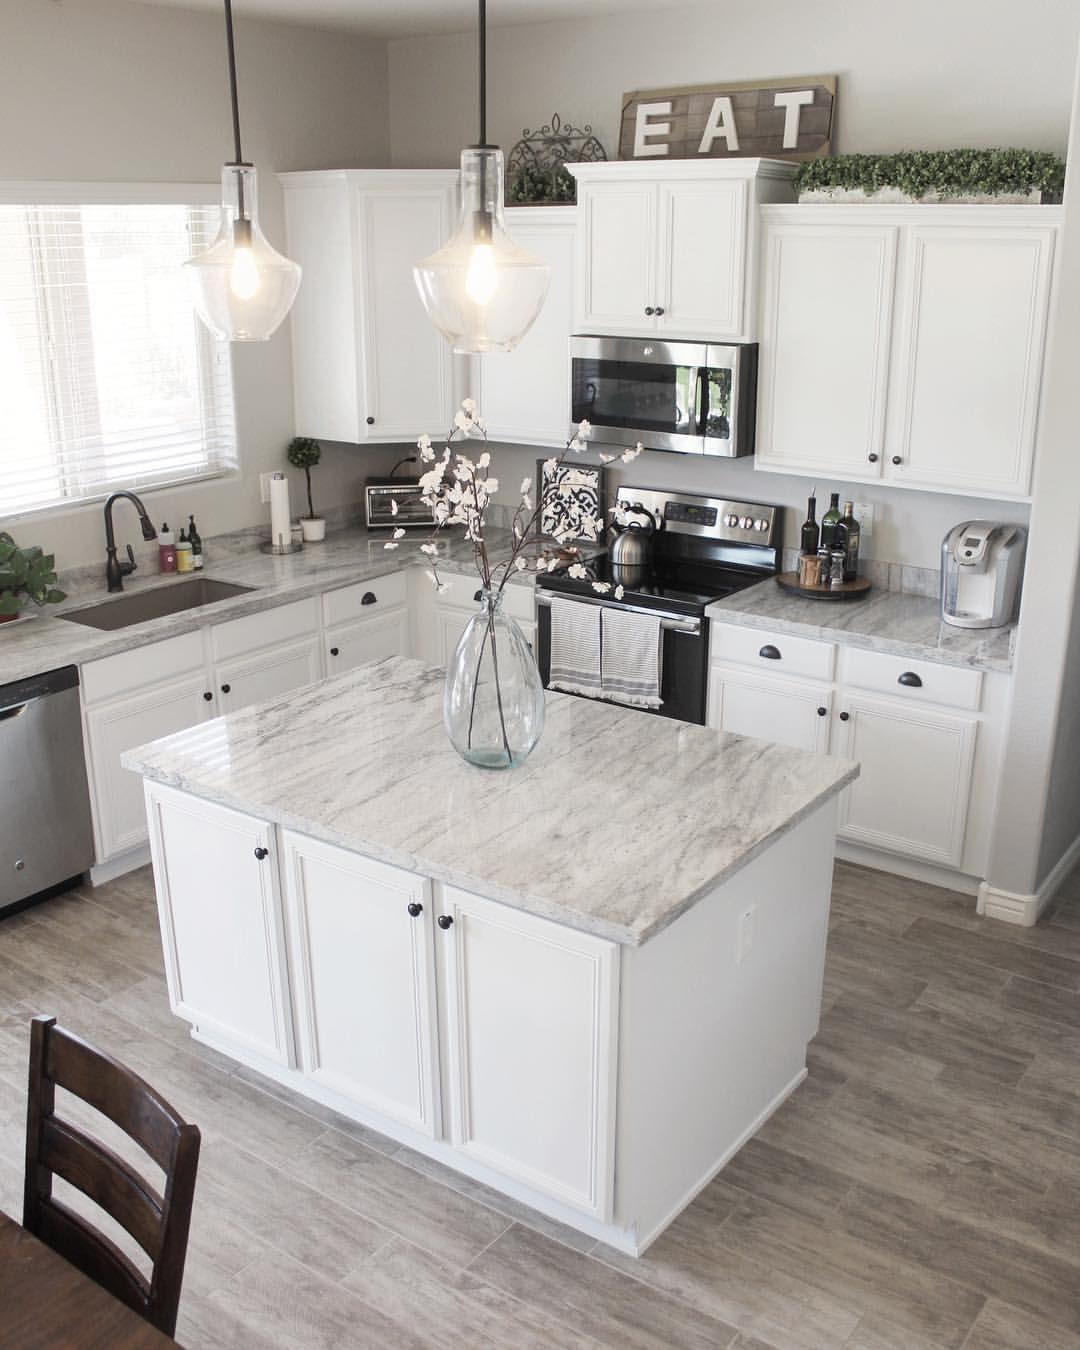 Vote on Our Kitchen Backsplash! And Kitchen/Dining Room Decor Sources #houseideas